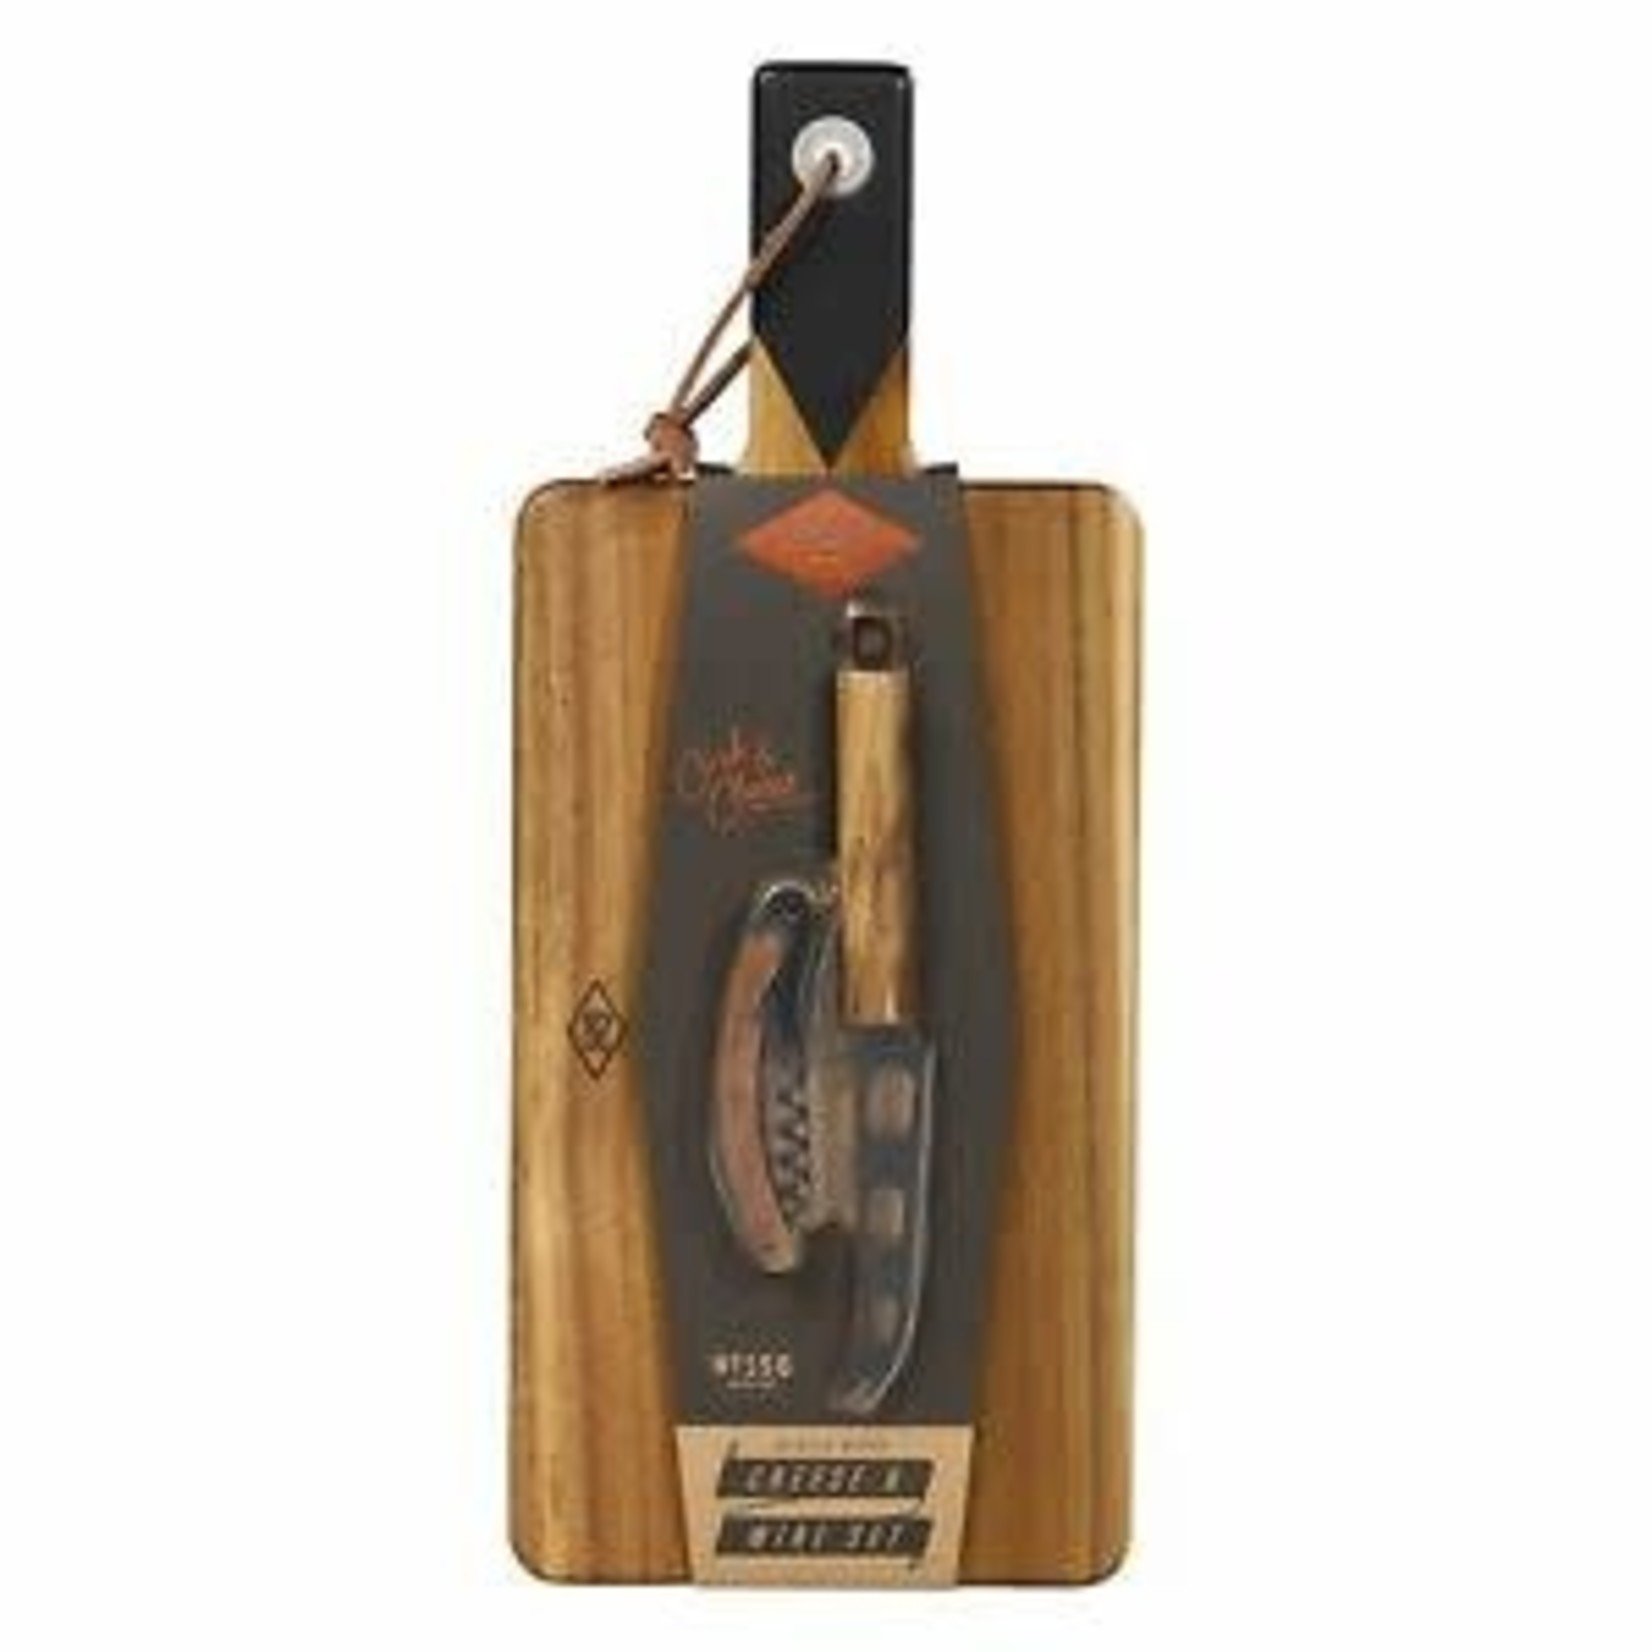 Gentleman's Hardware Cheese Board, Knife & Wine Opener Set